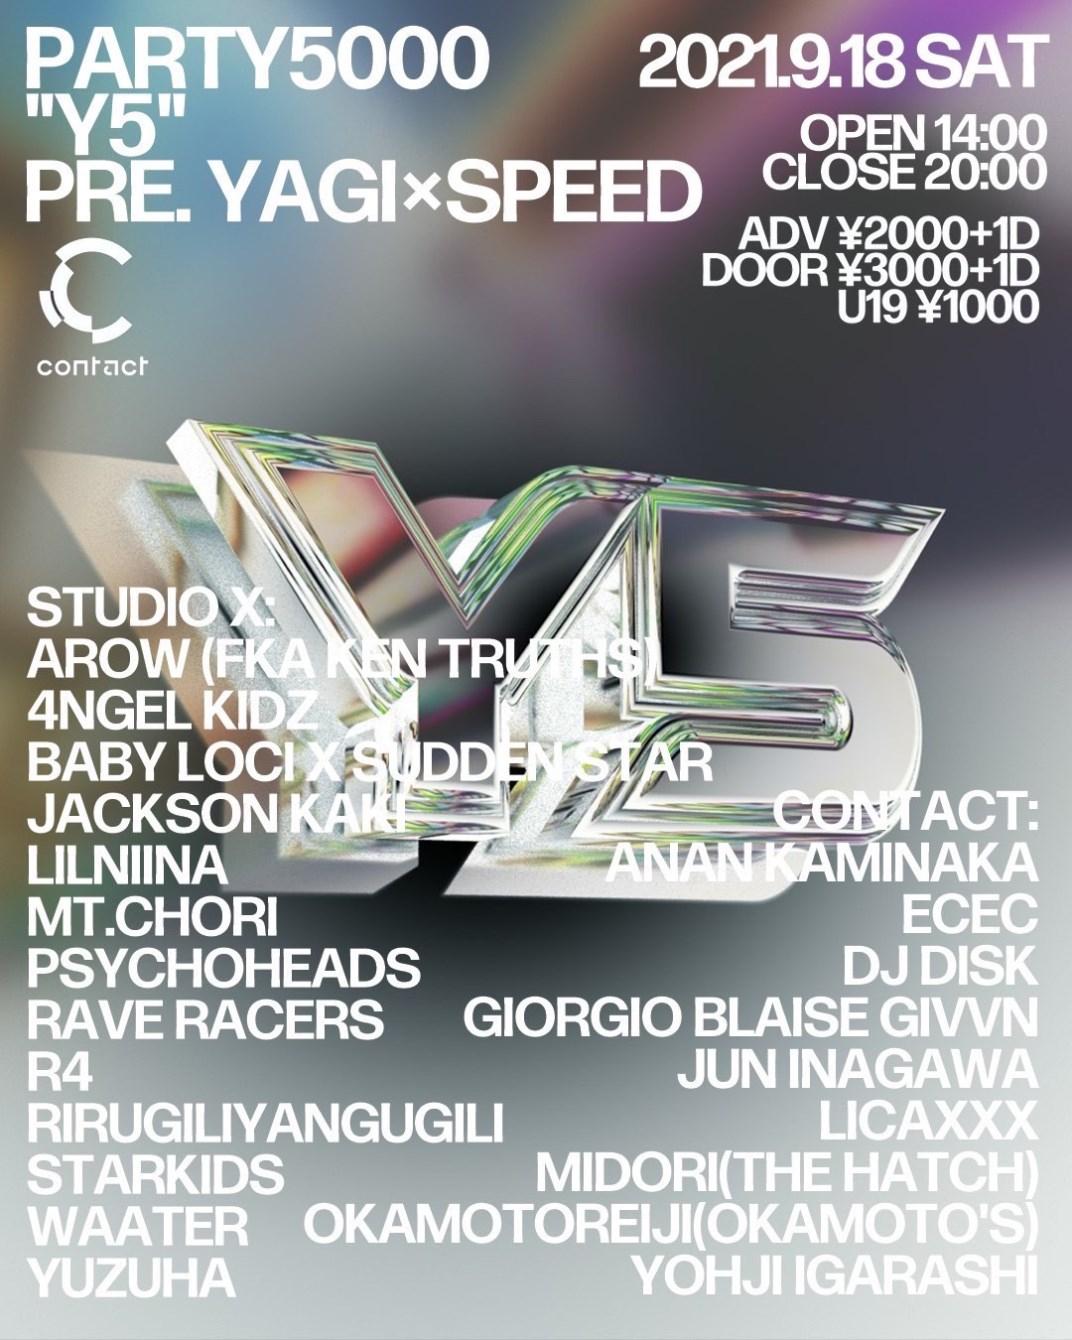 Y5 -Party5000 PRE. Yagi × Speed- - Flyer front